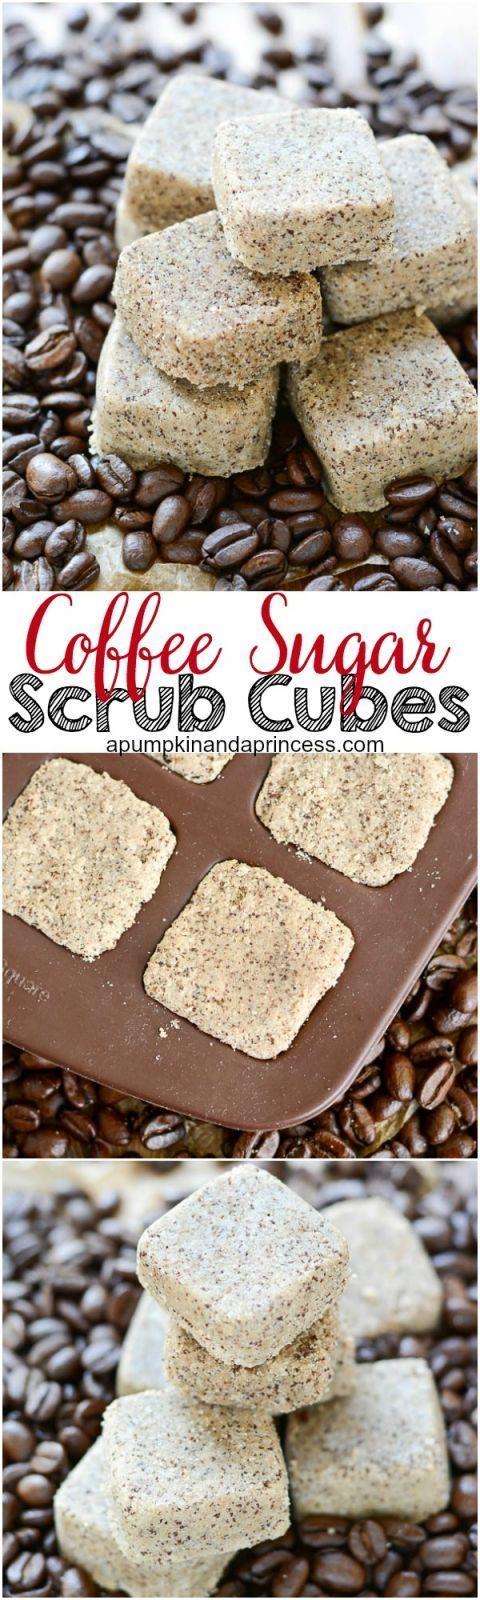 Coffee Sugar Scrub Cubes - exfoliate and replenish moisture with these coffee sugar scrub cubes. They make a great handmade gift for Christmas!